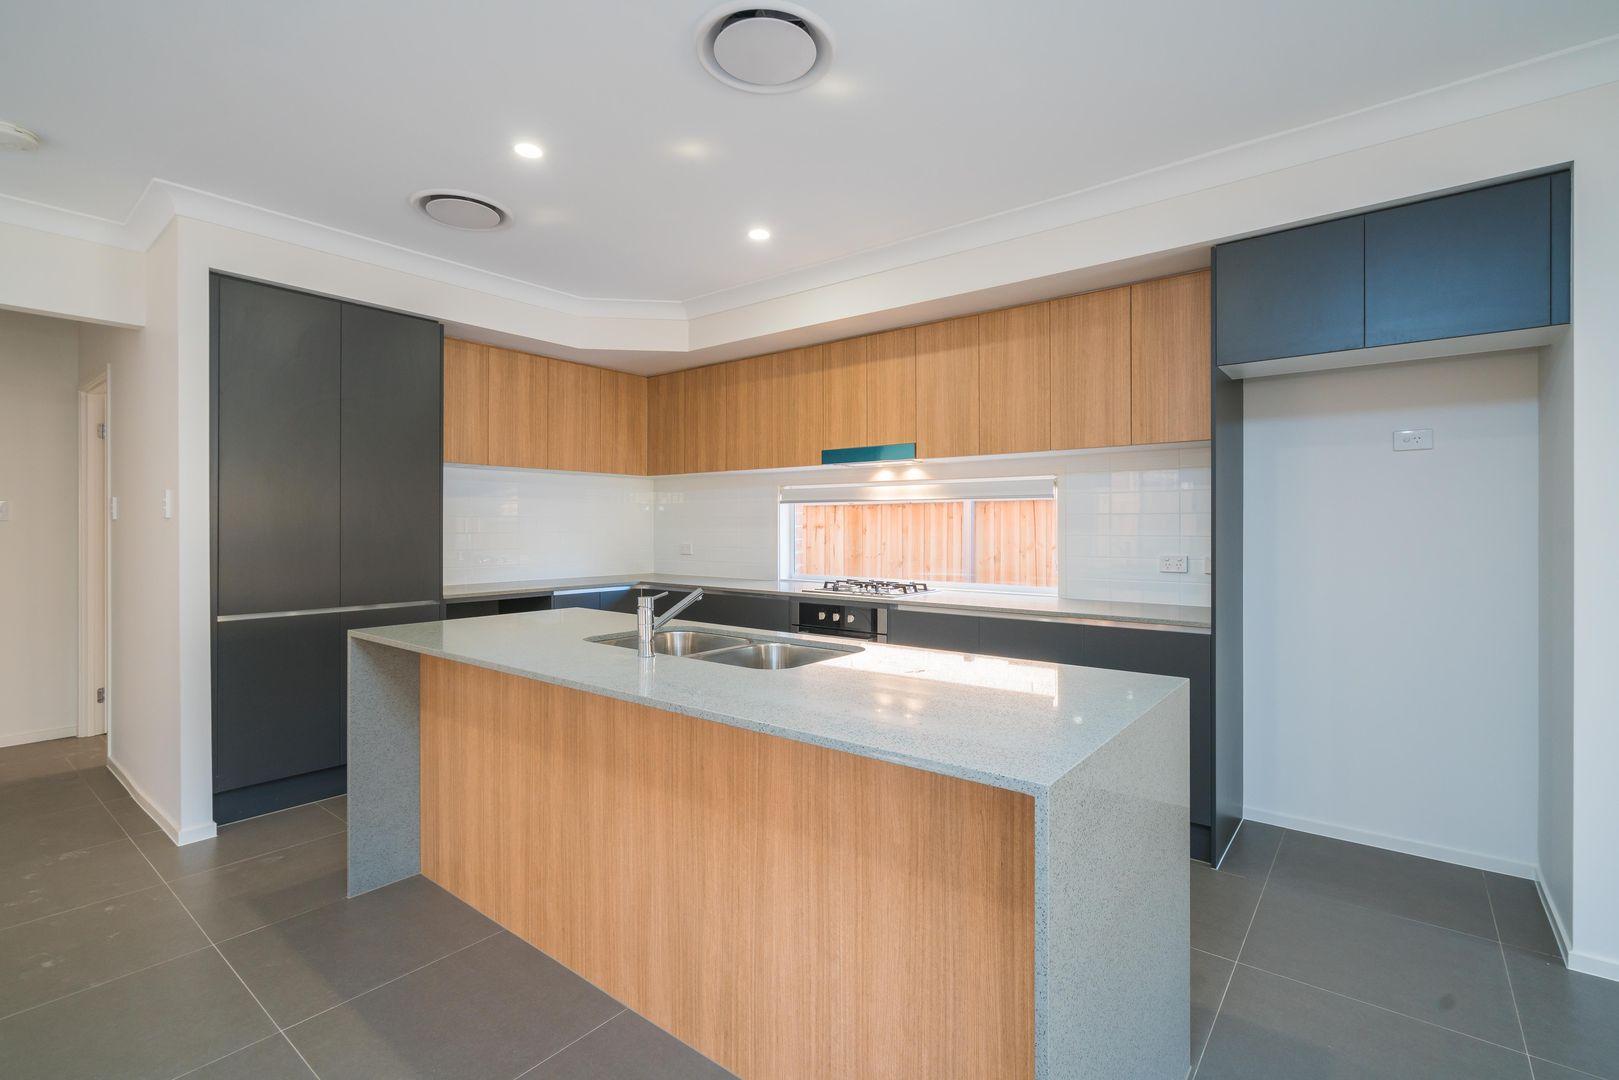 128 Dalmatia Ave, Edmondson Park NSW 2174, Image 1